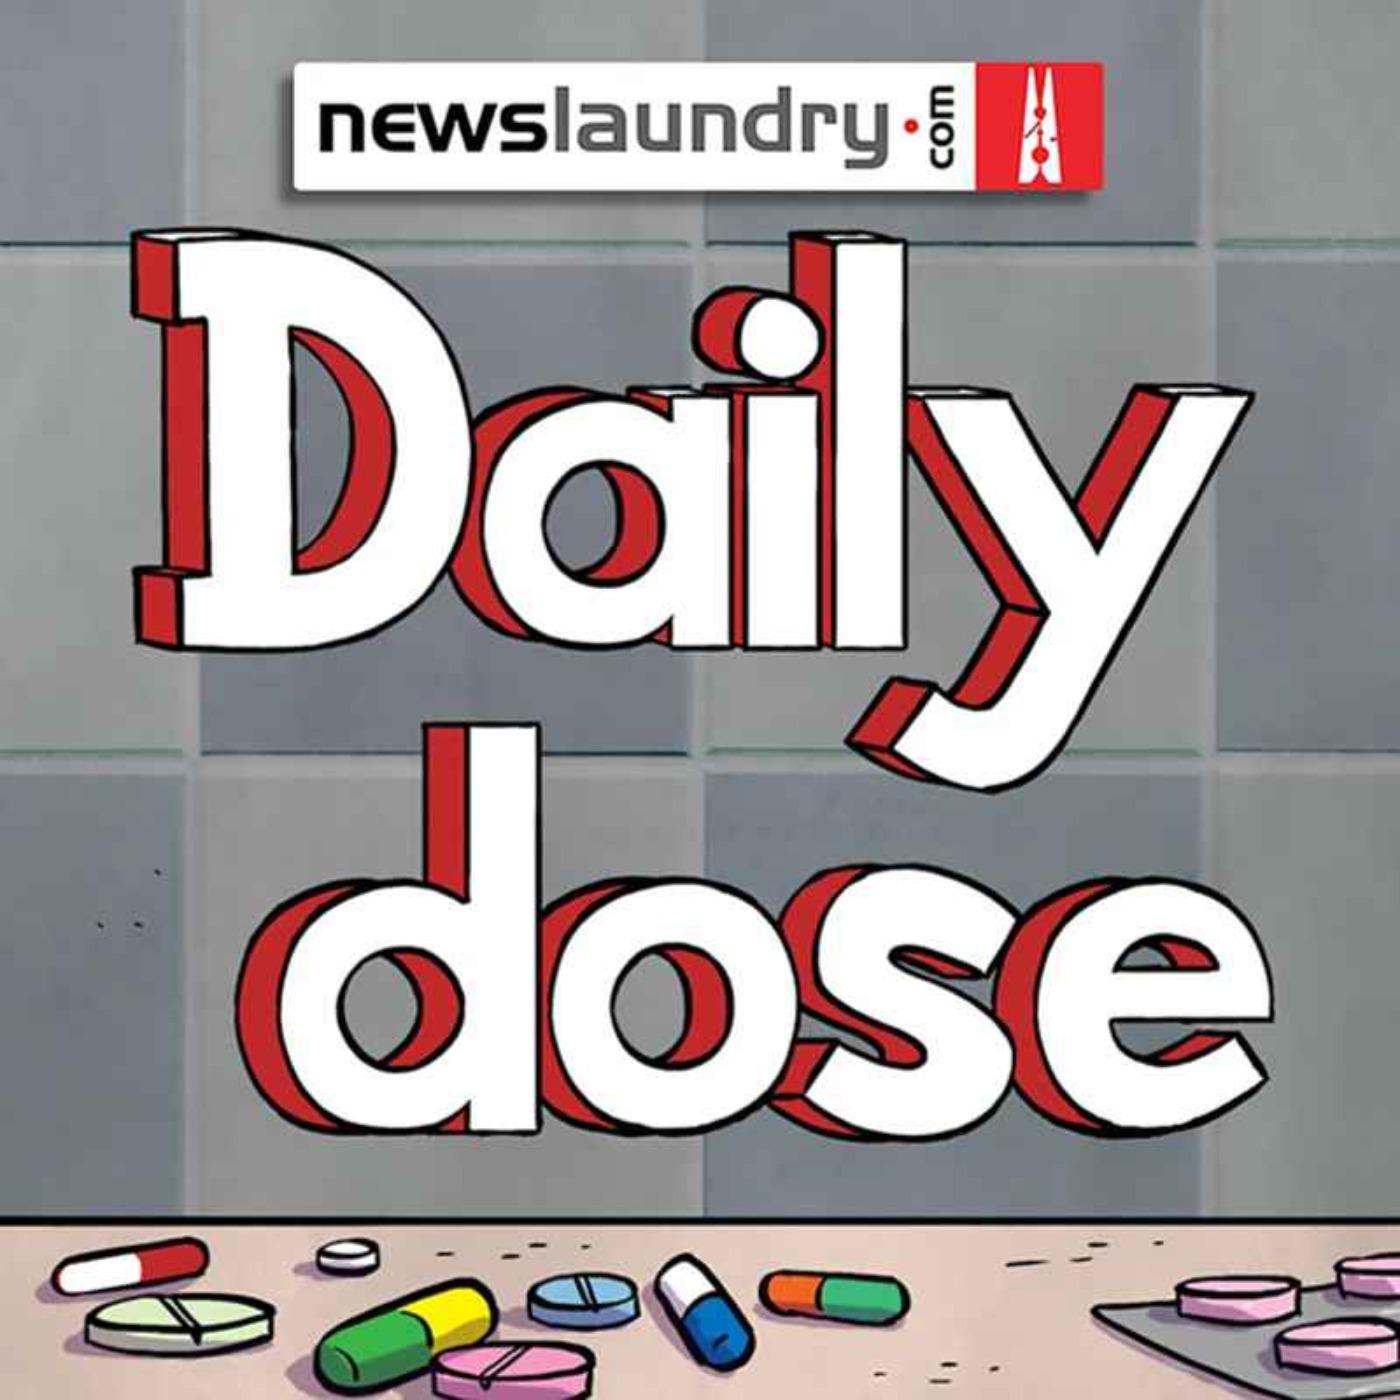 Daily Dose Ep 542: Delhi HC on Bollywood defamation case, firecracker ban, and Rwandan genocide trial